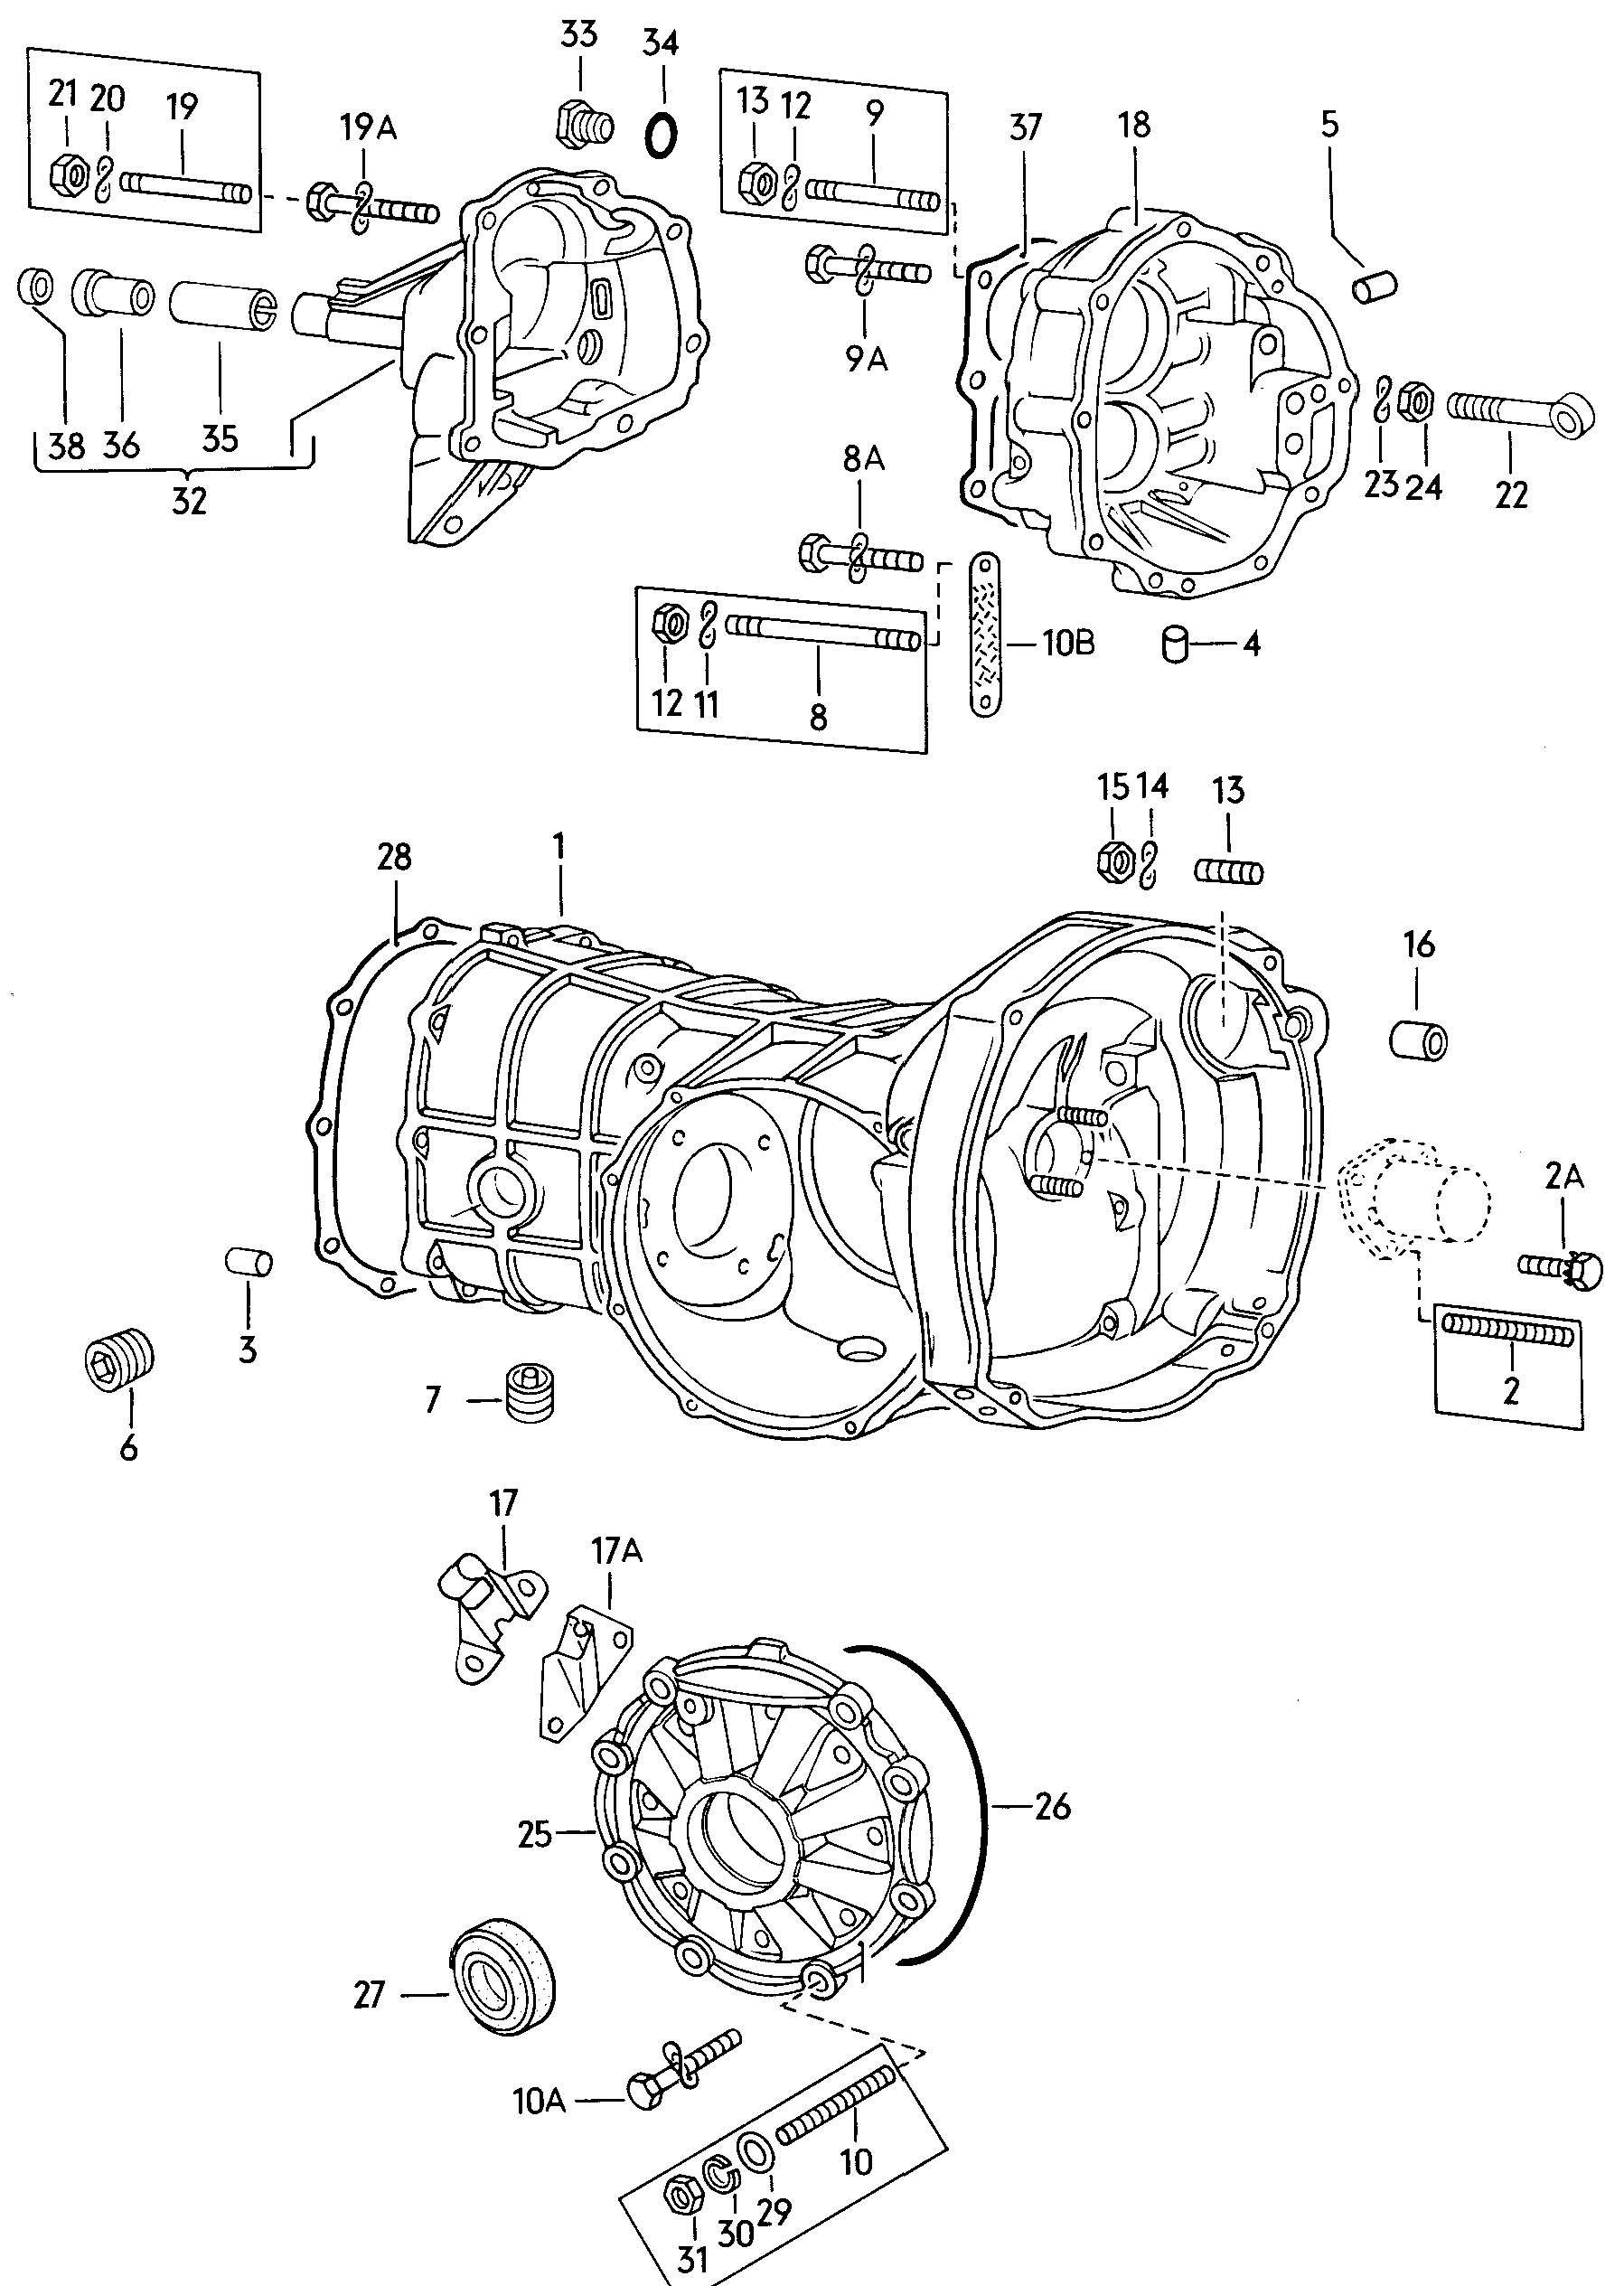 vw beetle transmission diagram 2002 saturn sl2 wiring schematic free download